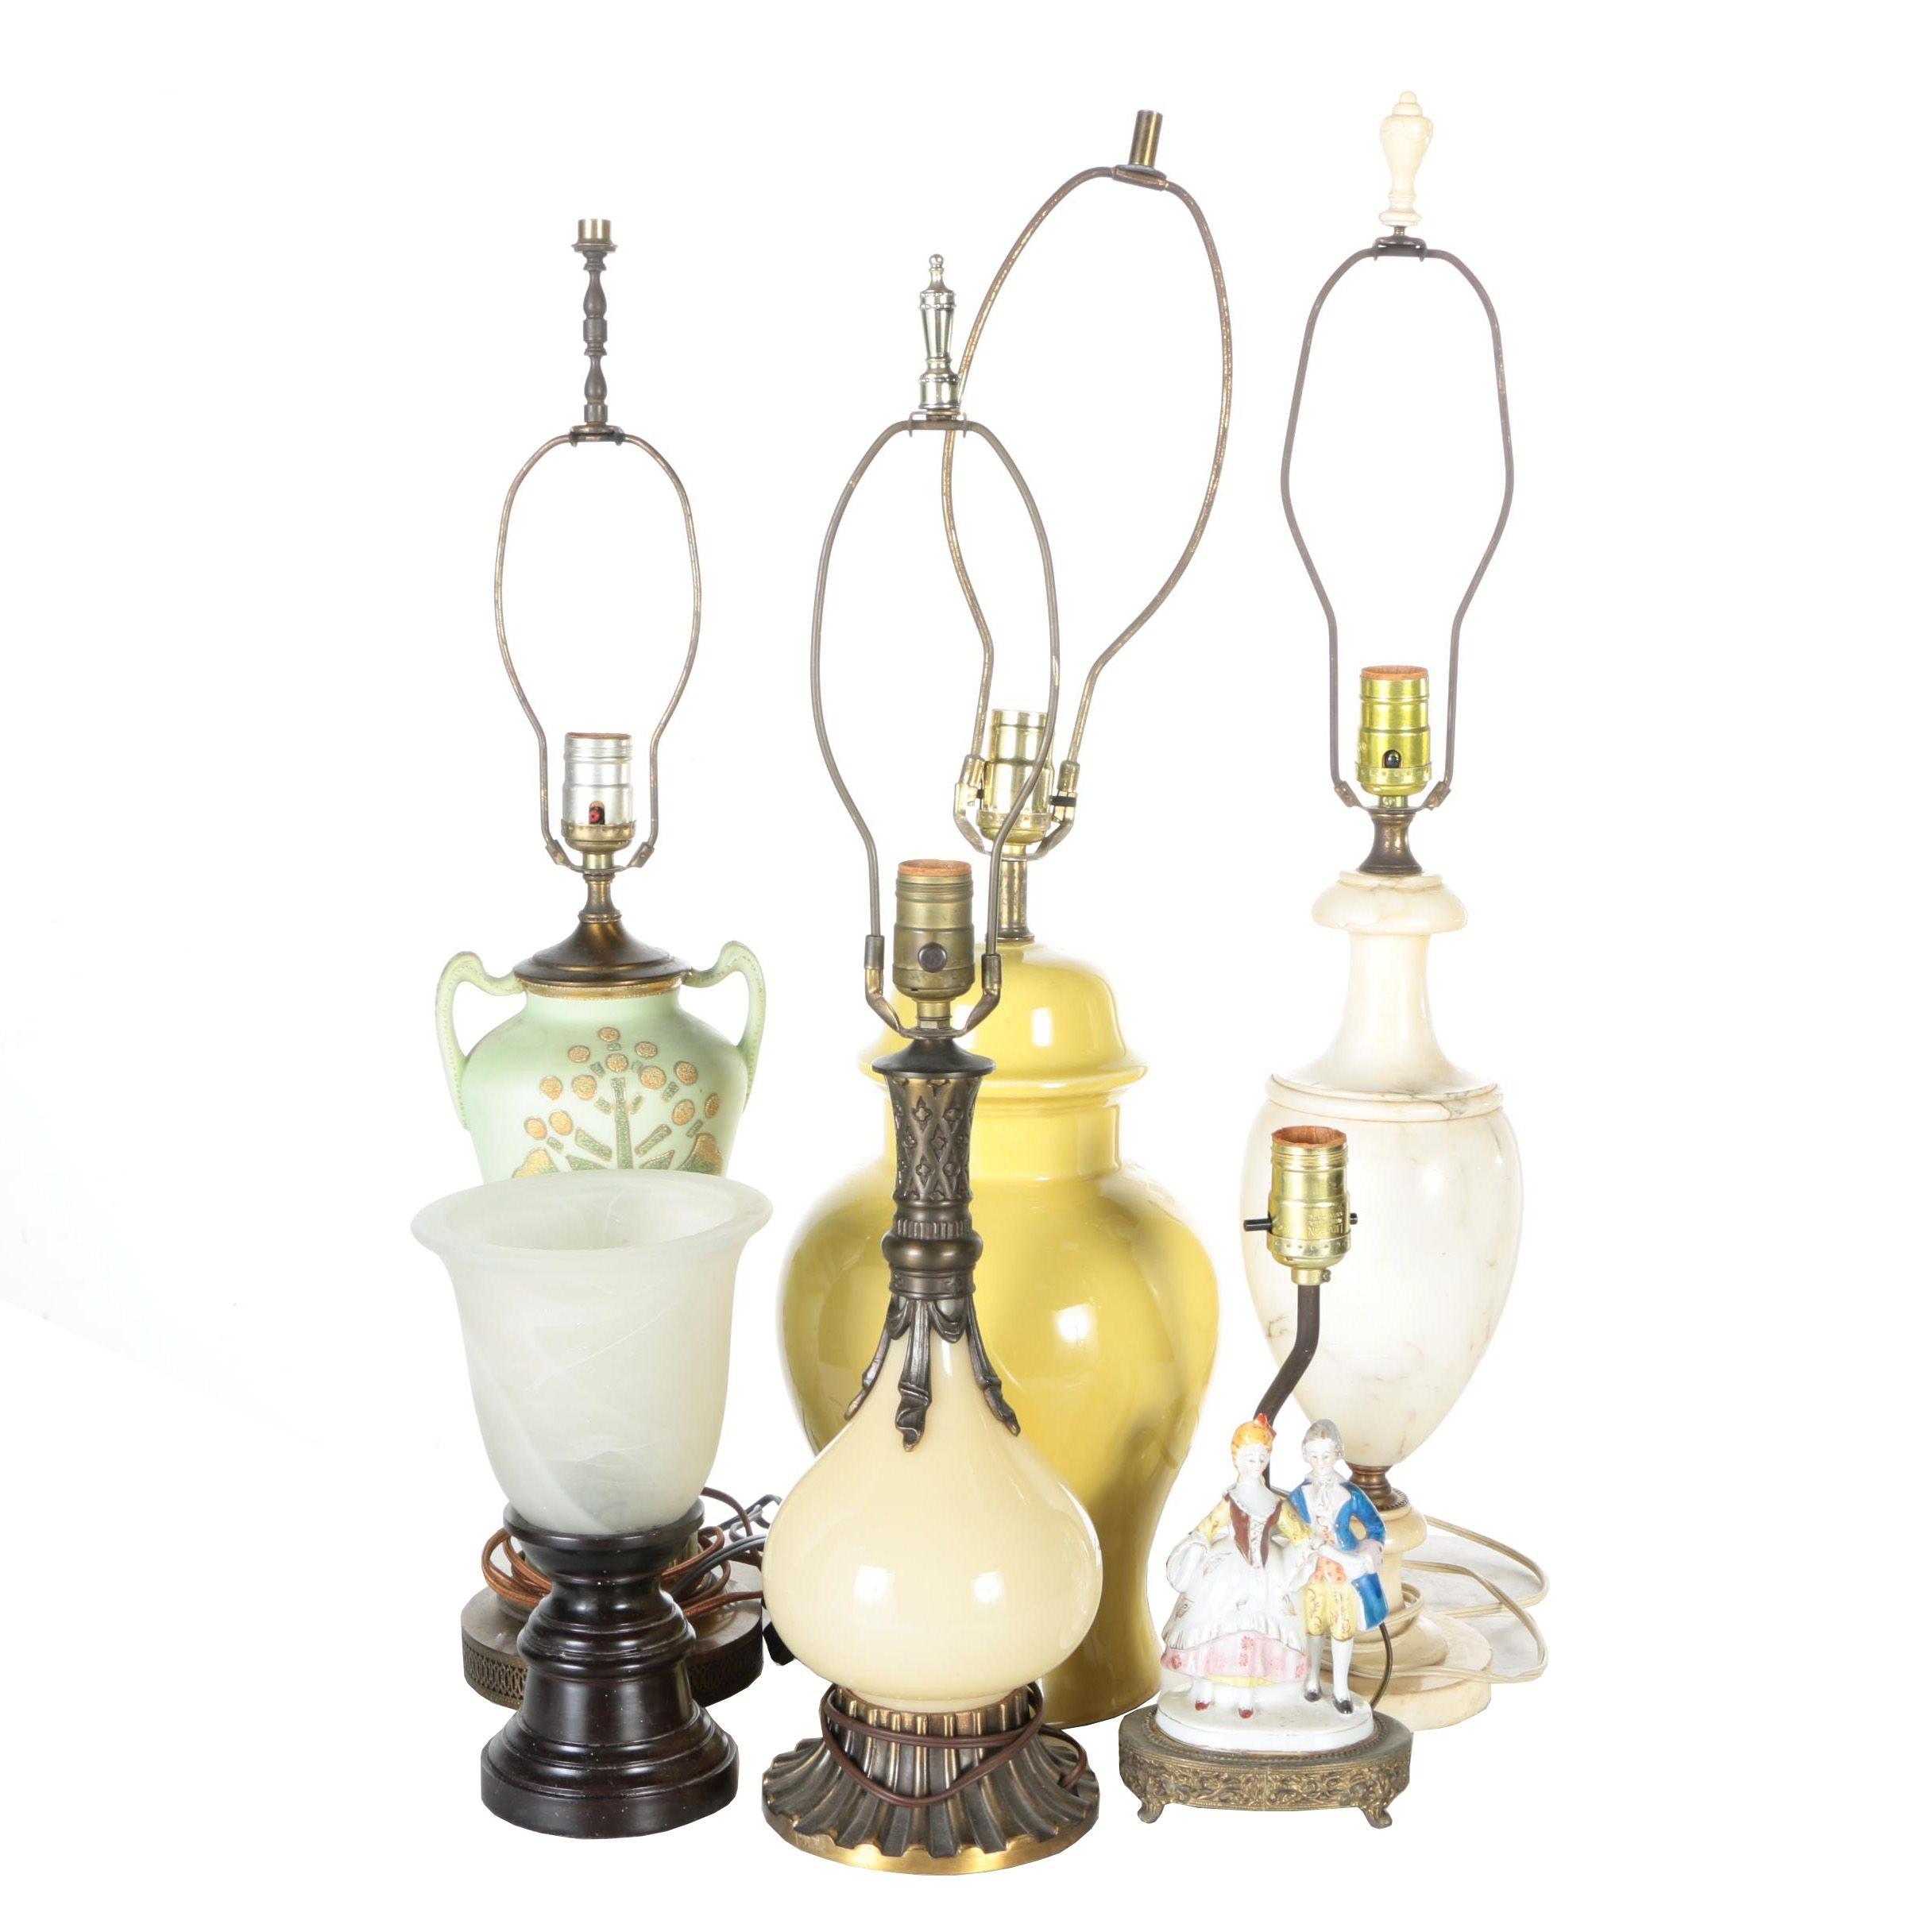 Metal and Ceramic Table Lamps